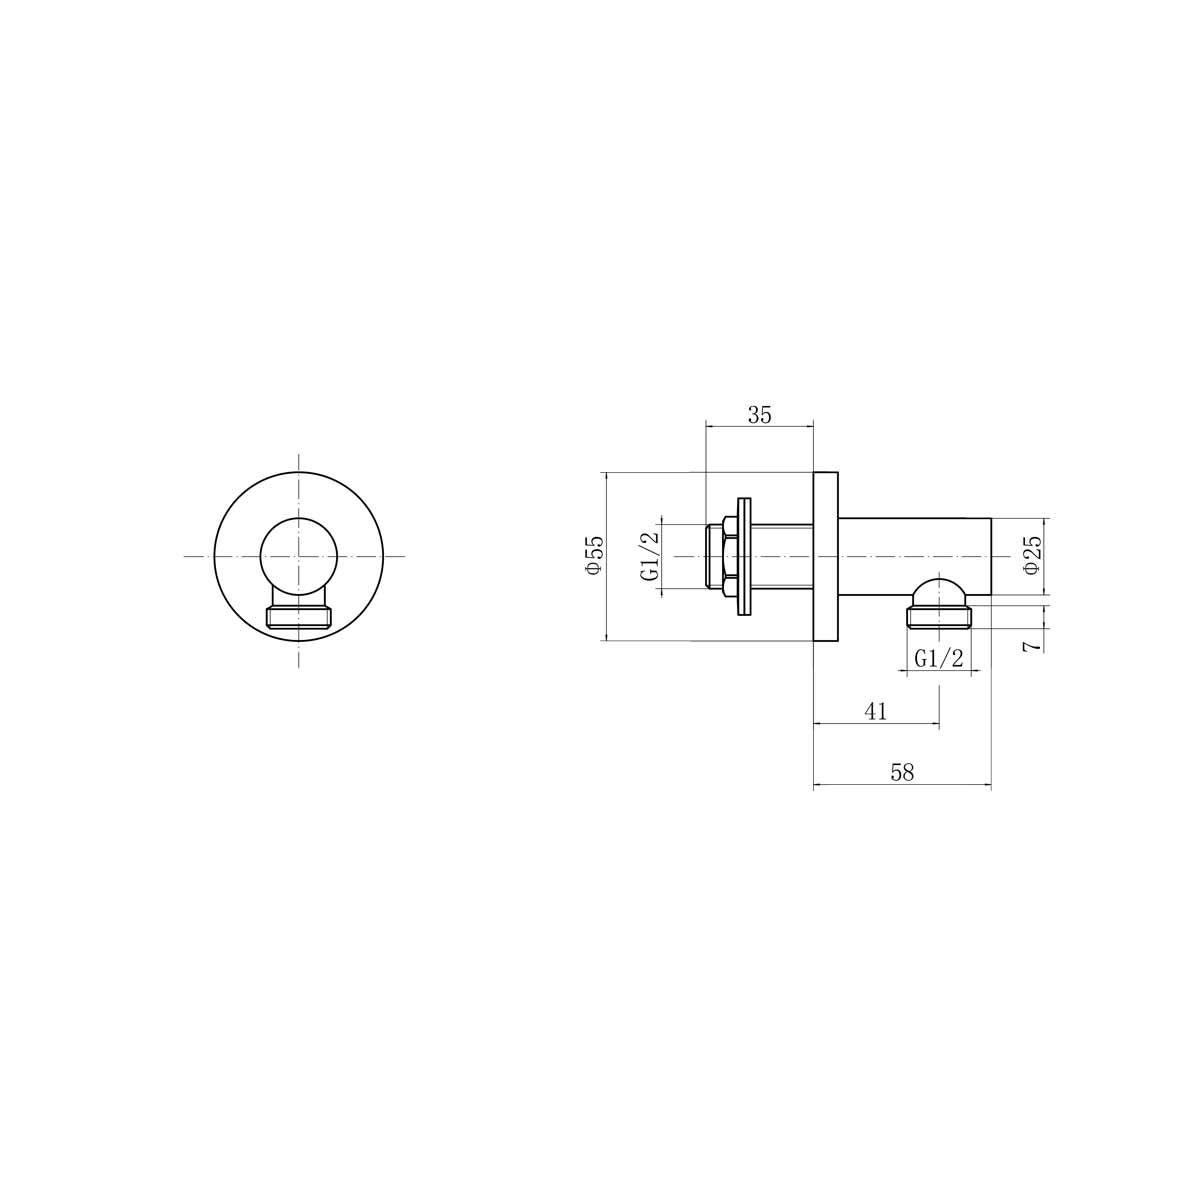 rondothermostatictwinconcealedshowervalvesystemtech1